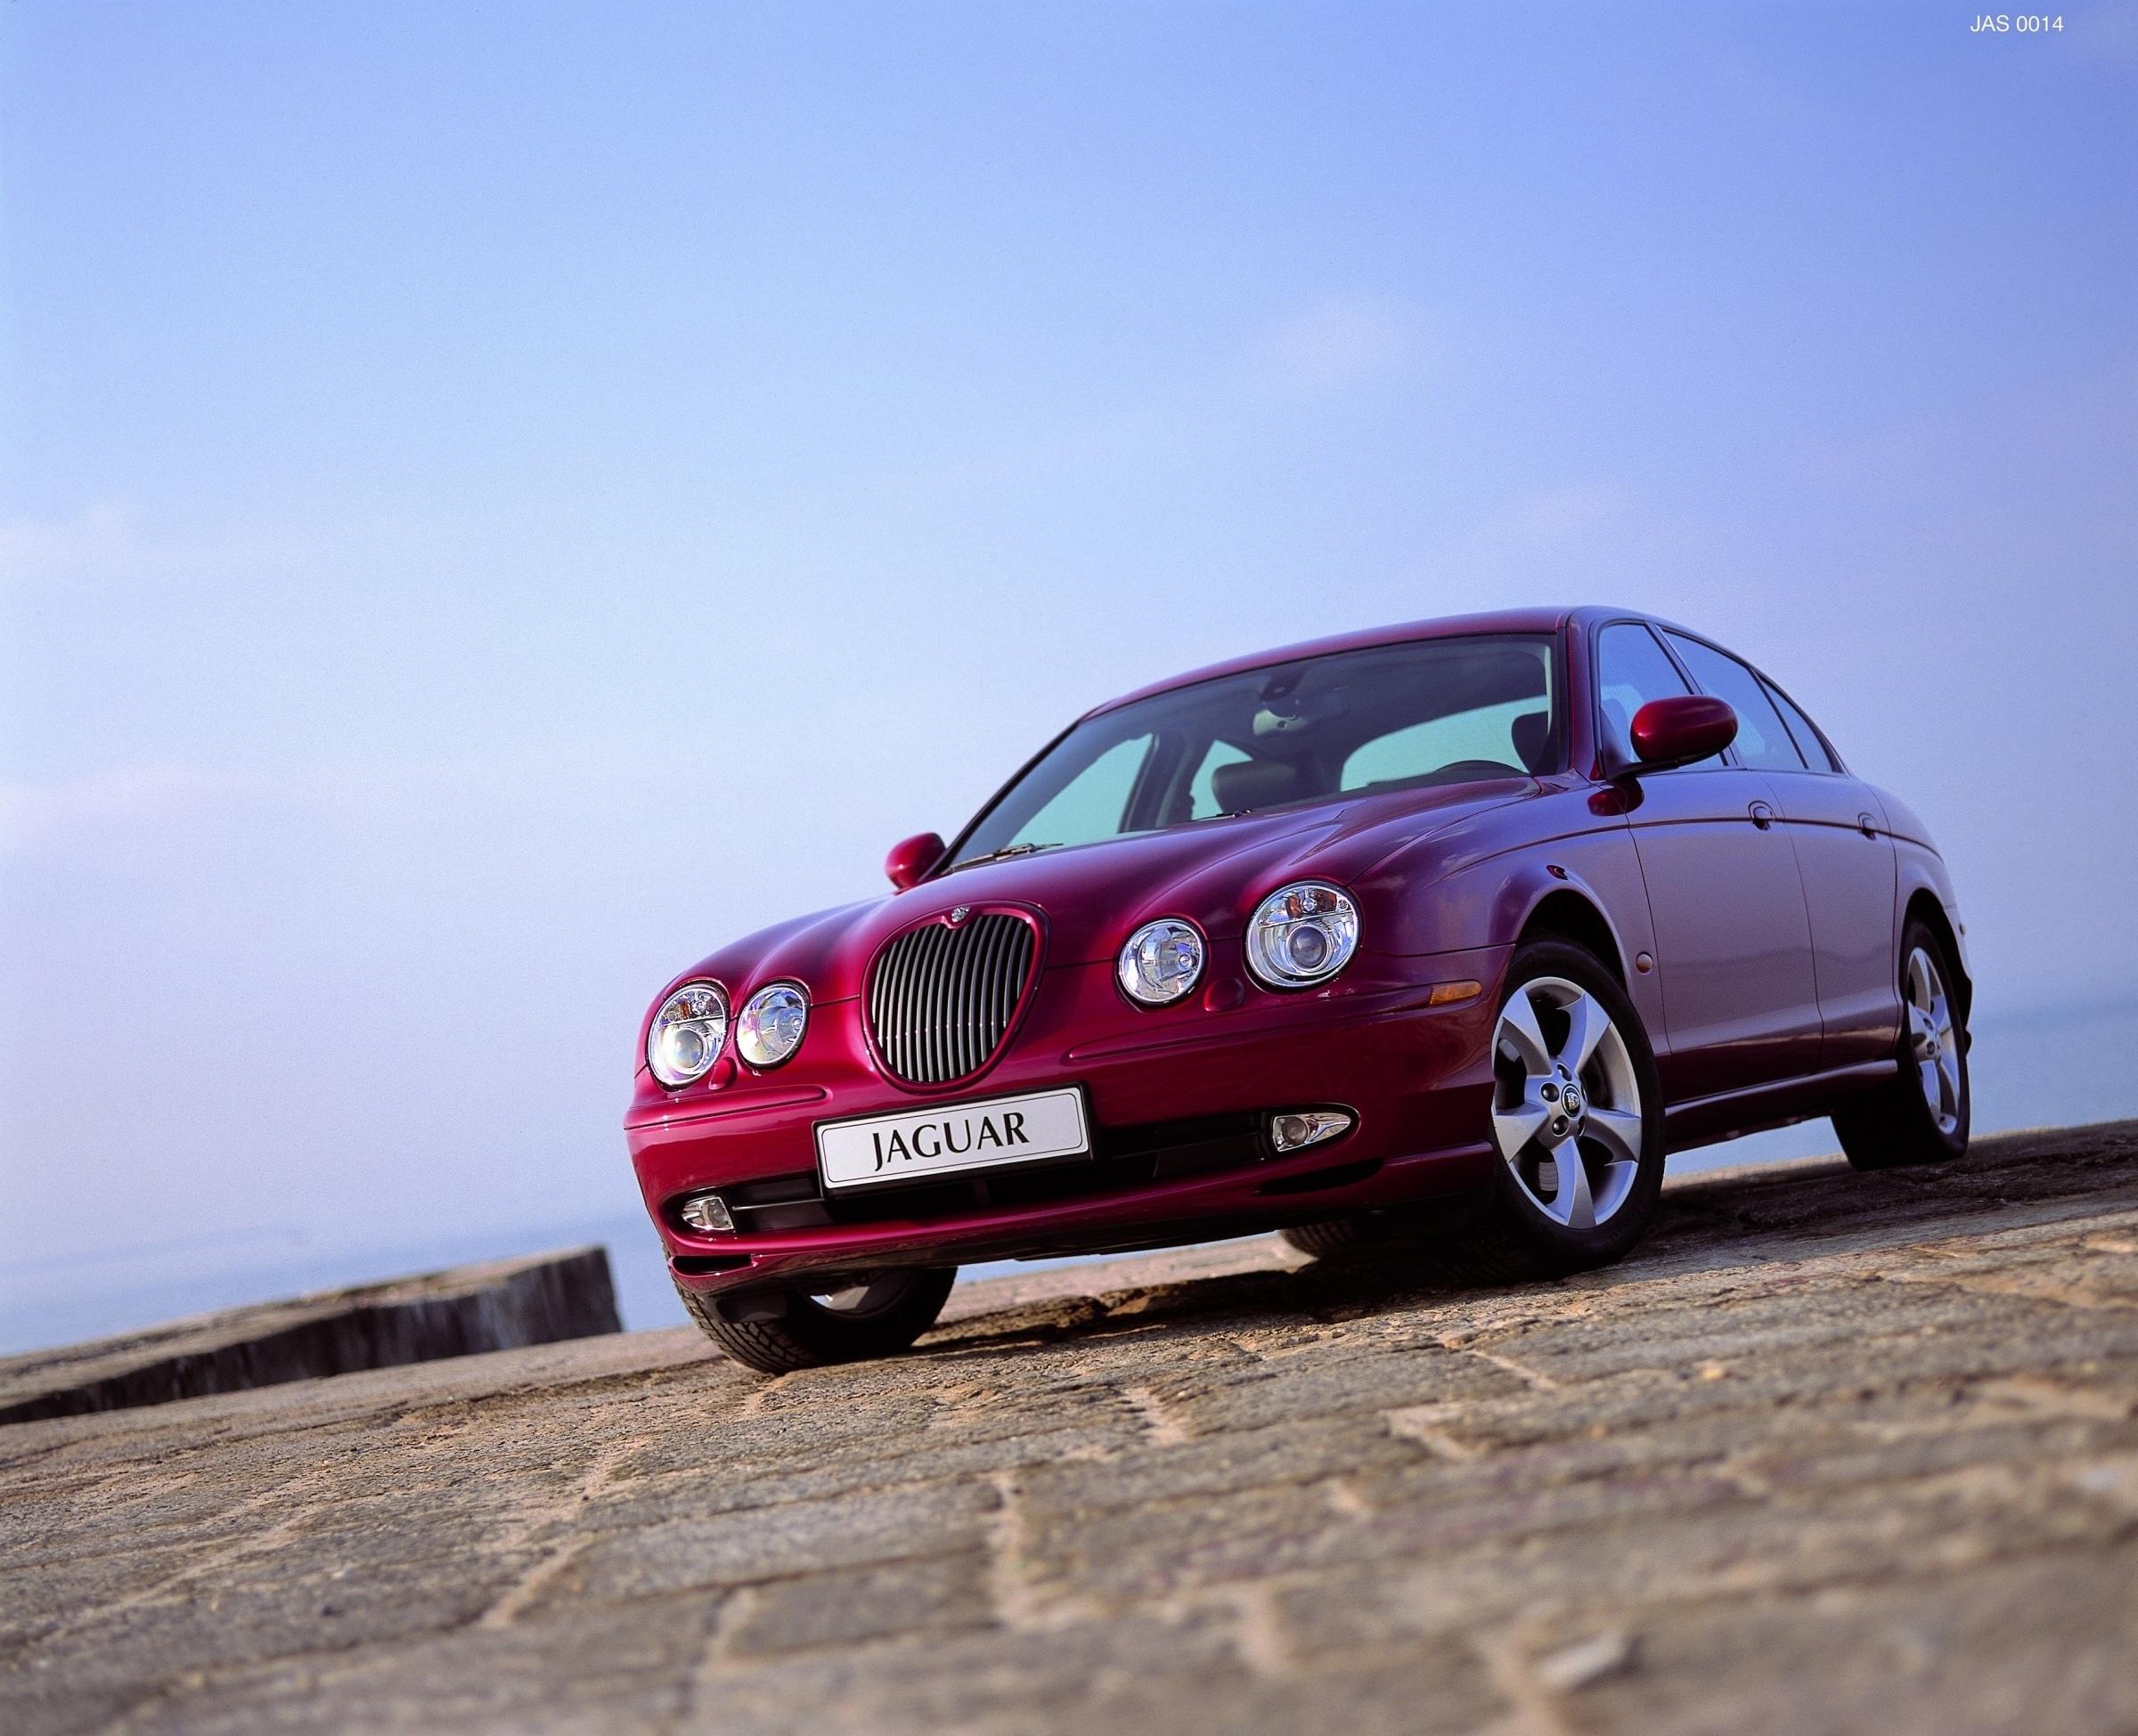 Jaguar S Type, Jaguar XJ, Jaguar, XJ, XJ6, XJ8, XJR, V8 straight-six, british car, gaydon, classic car, retro car, daimler, motoring, automotive, car, cars, british classic, gangster, snatch, ebay motors, autotrader